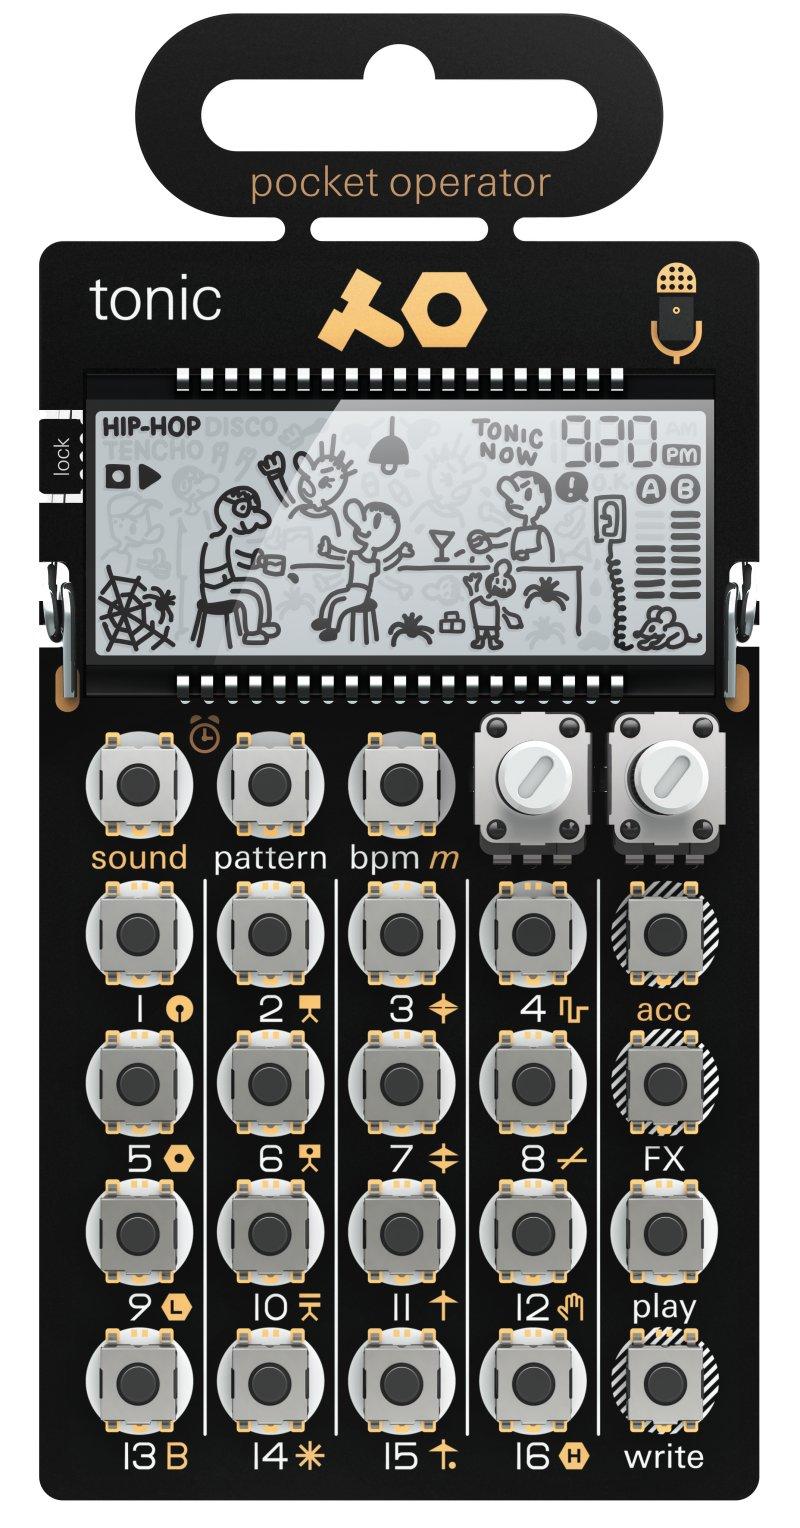 Dospievajúce Engineering Po-32 Tonic Synthesizer